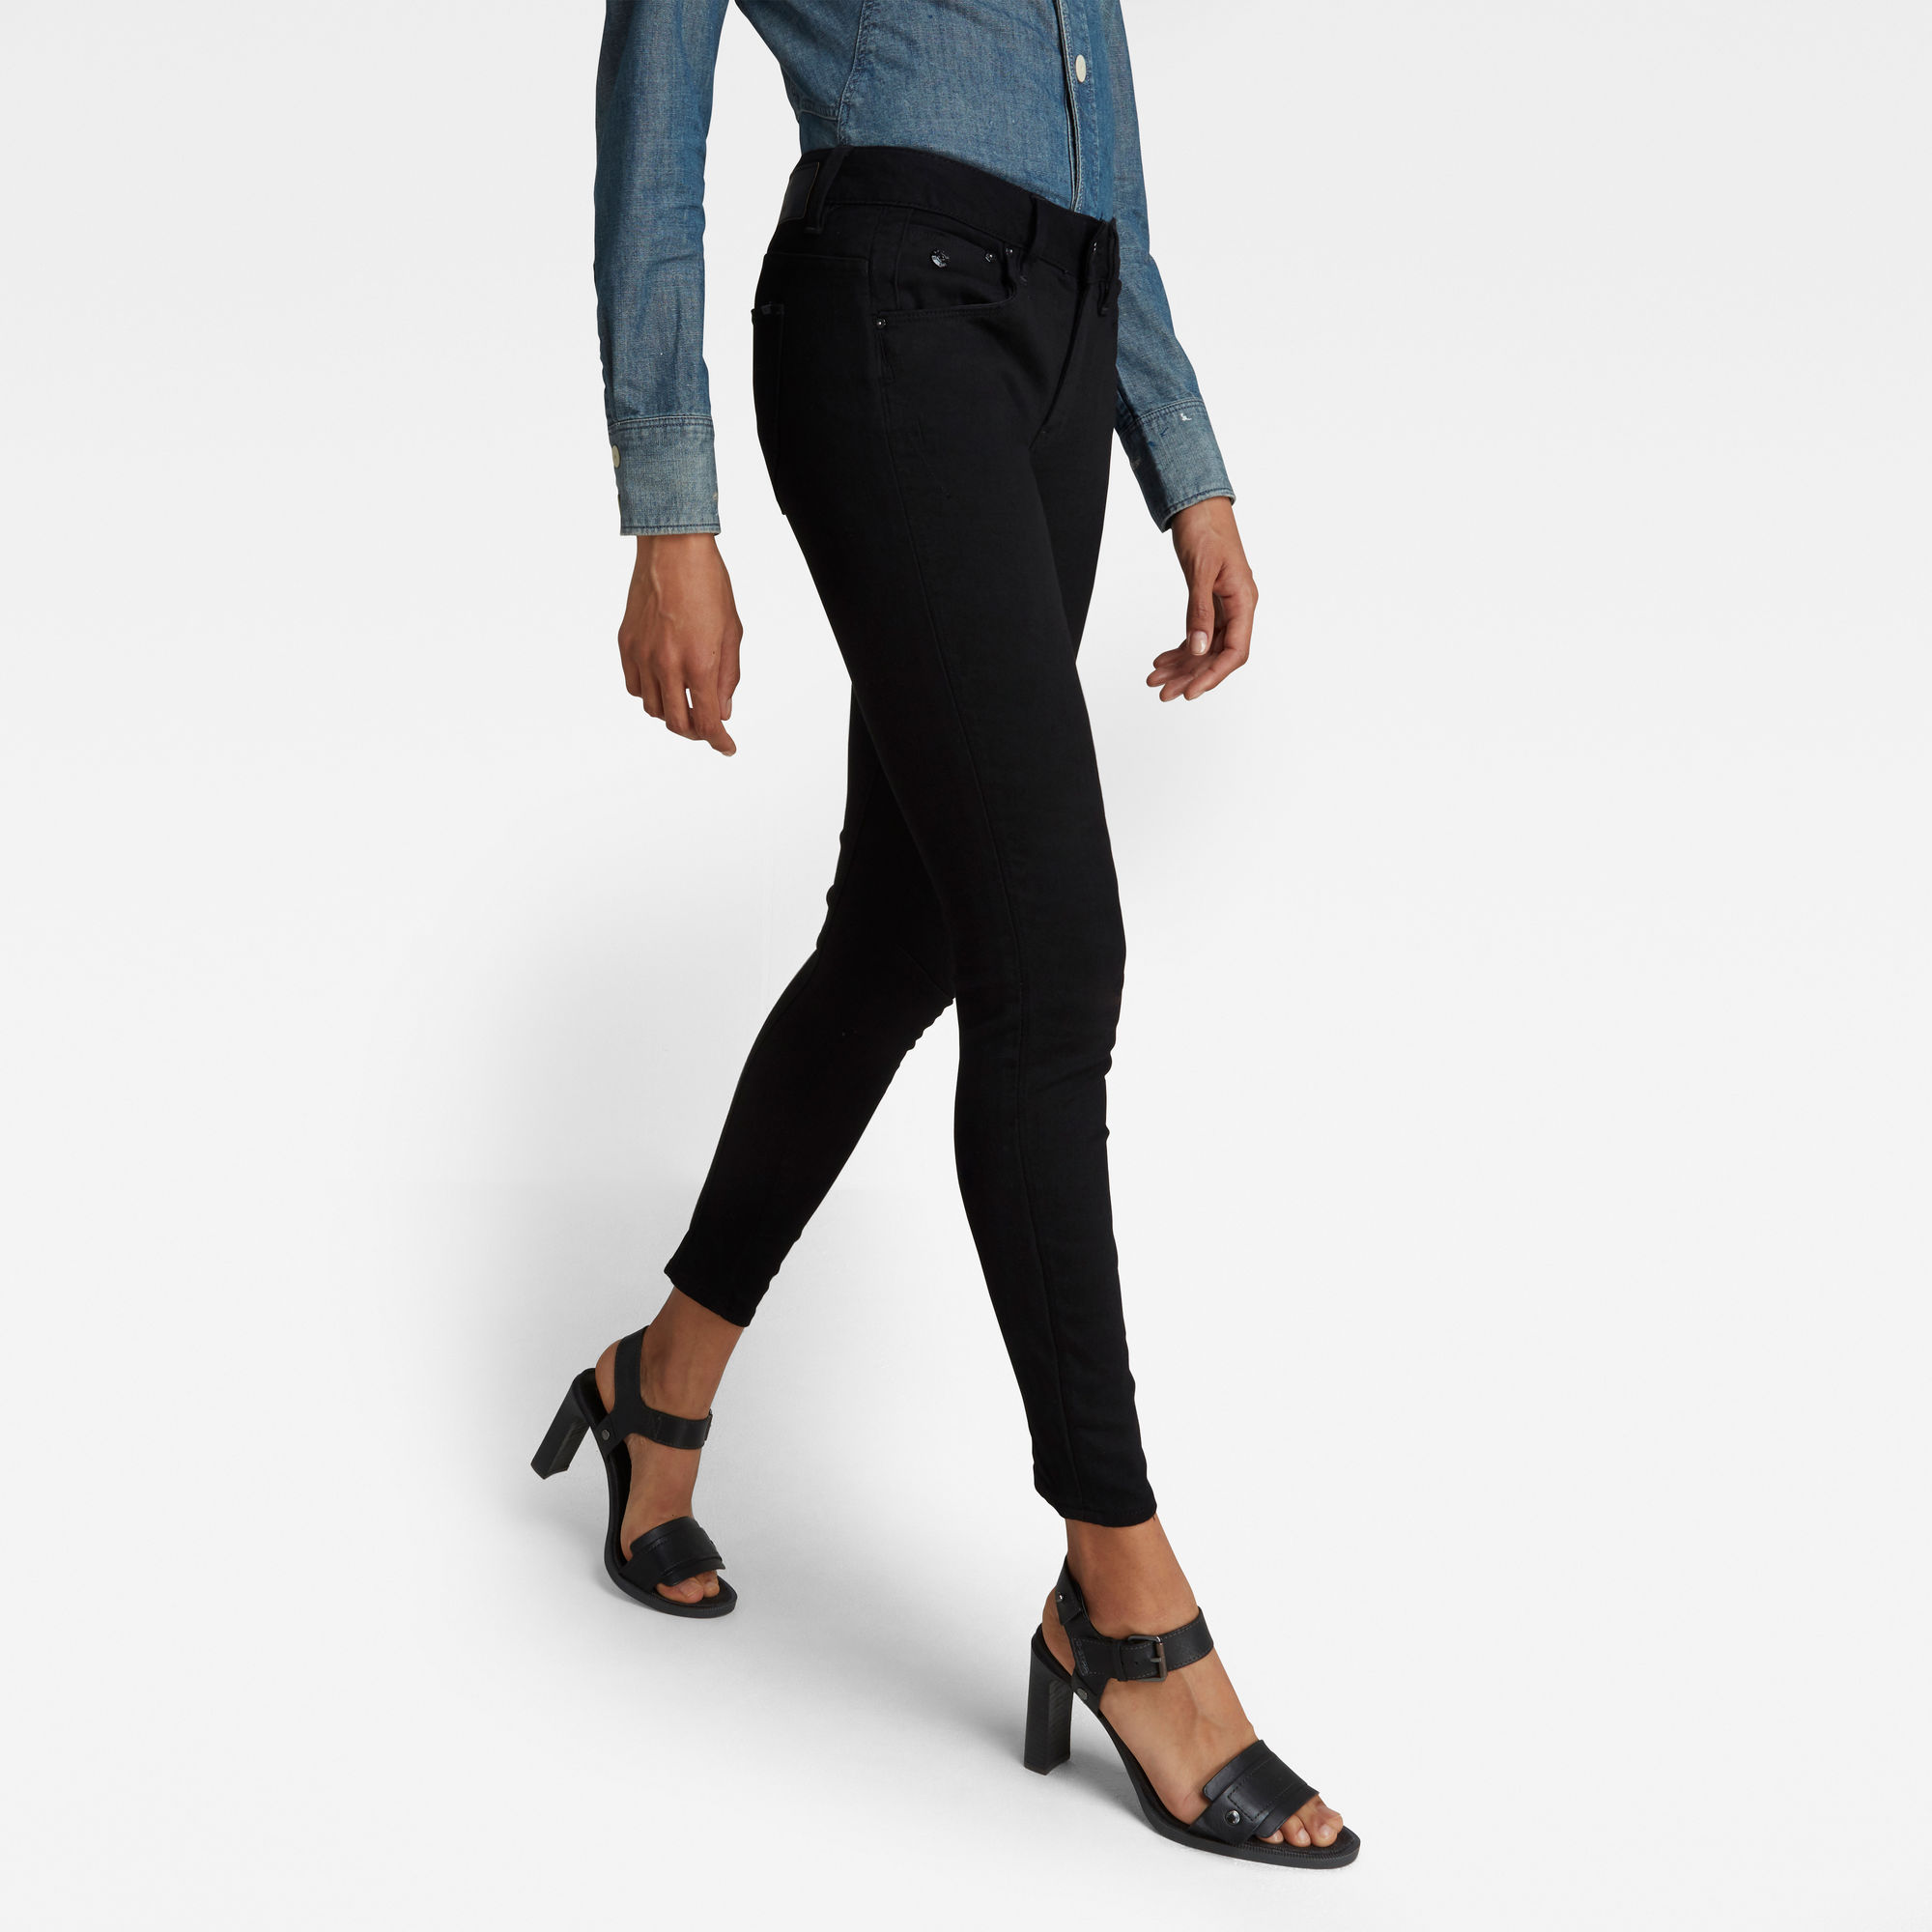 G-Star RAW Dames Arc 3D Mid Skinny Jeans Zwart